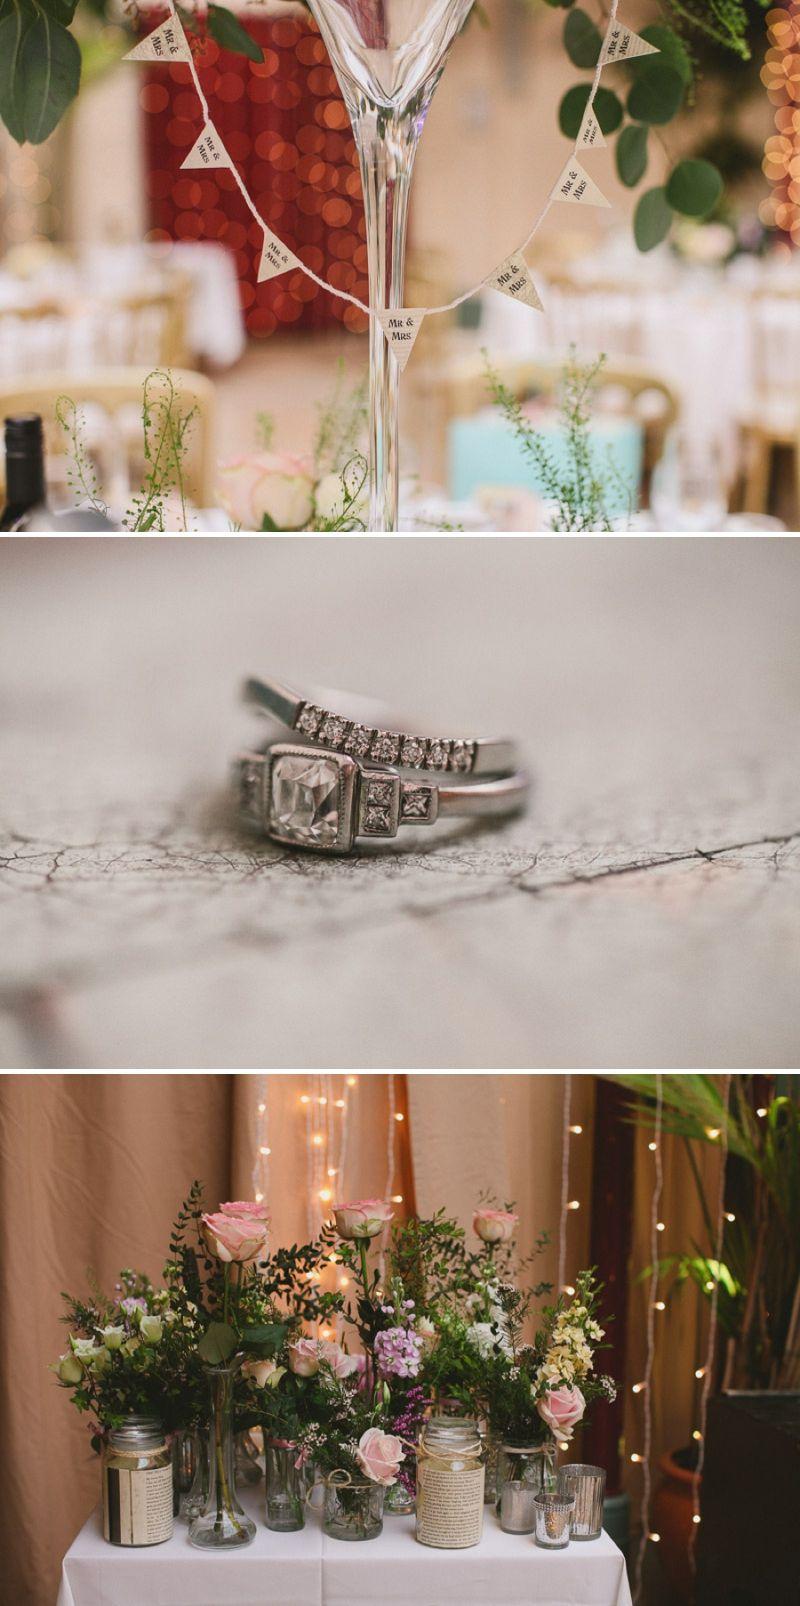 an elegant vintage inspired wedding at the winter gardens ilkley